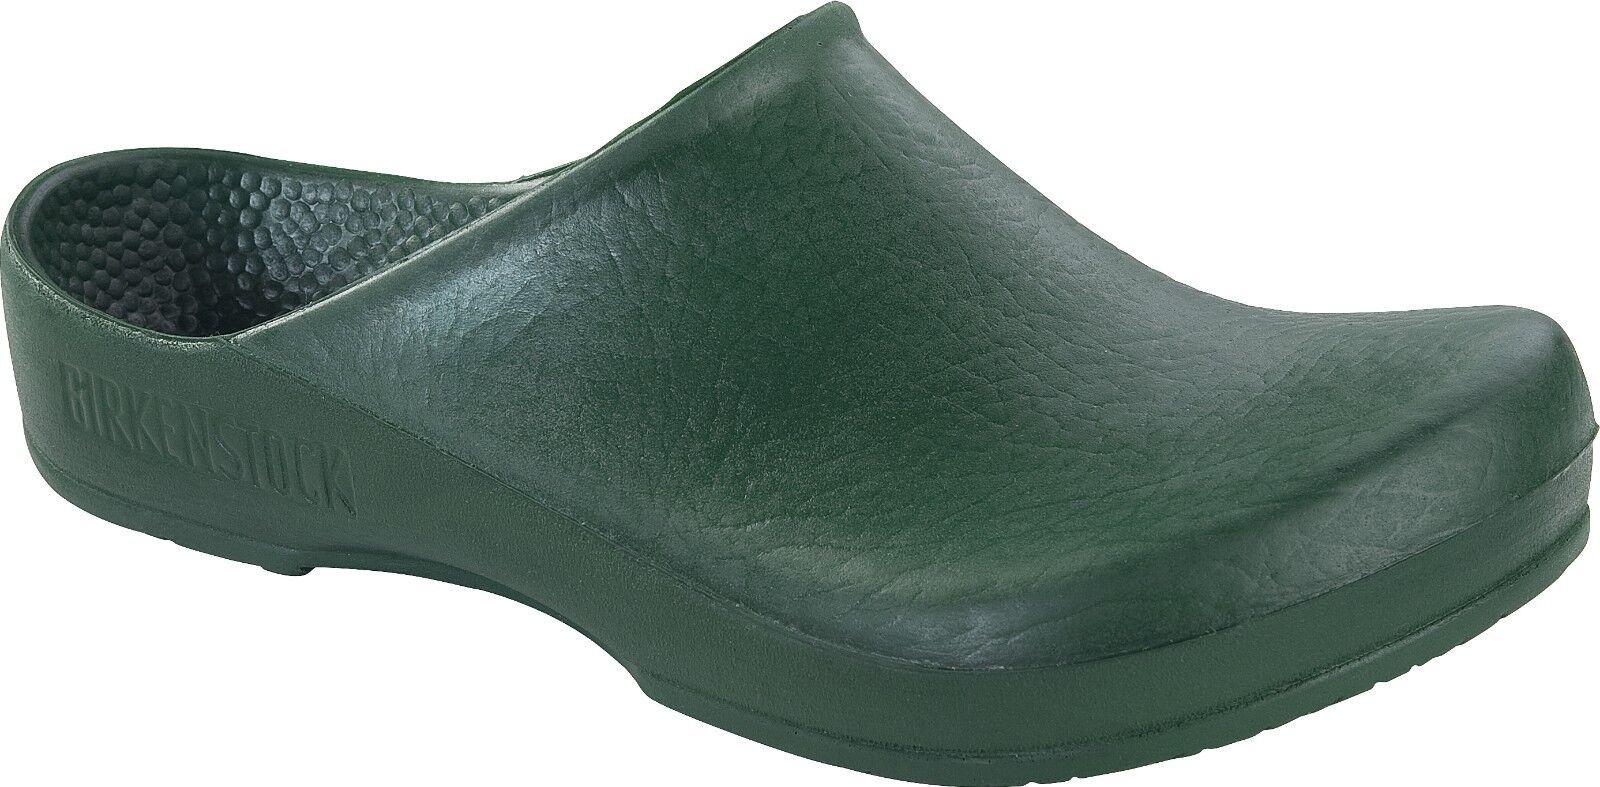 Birkenstock Birki grün Garten Clogs waschbar 67051 Garten Freizeit Beruf Schuhe